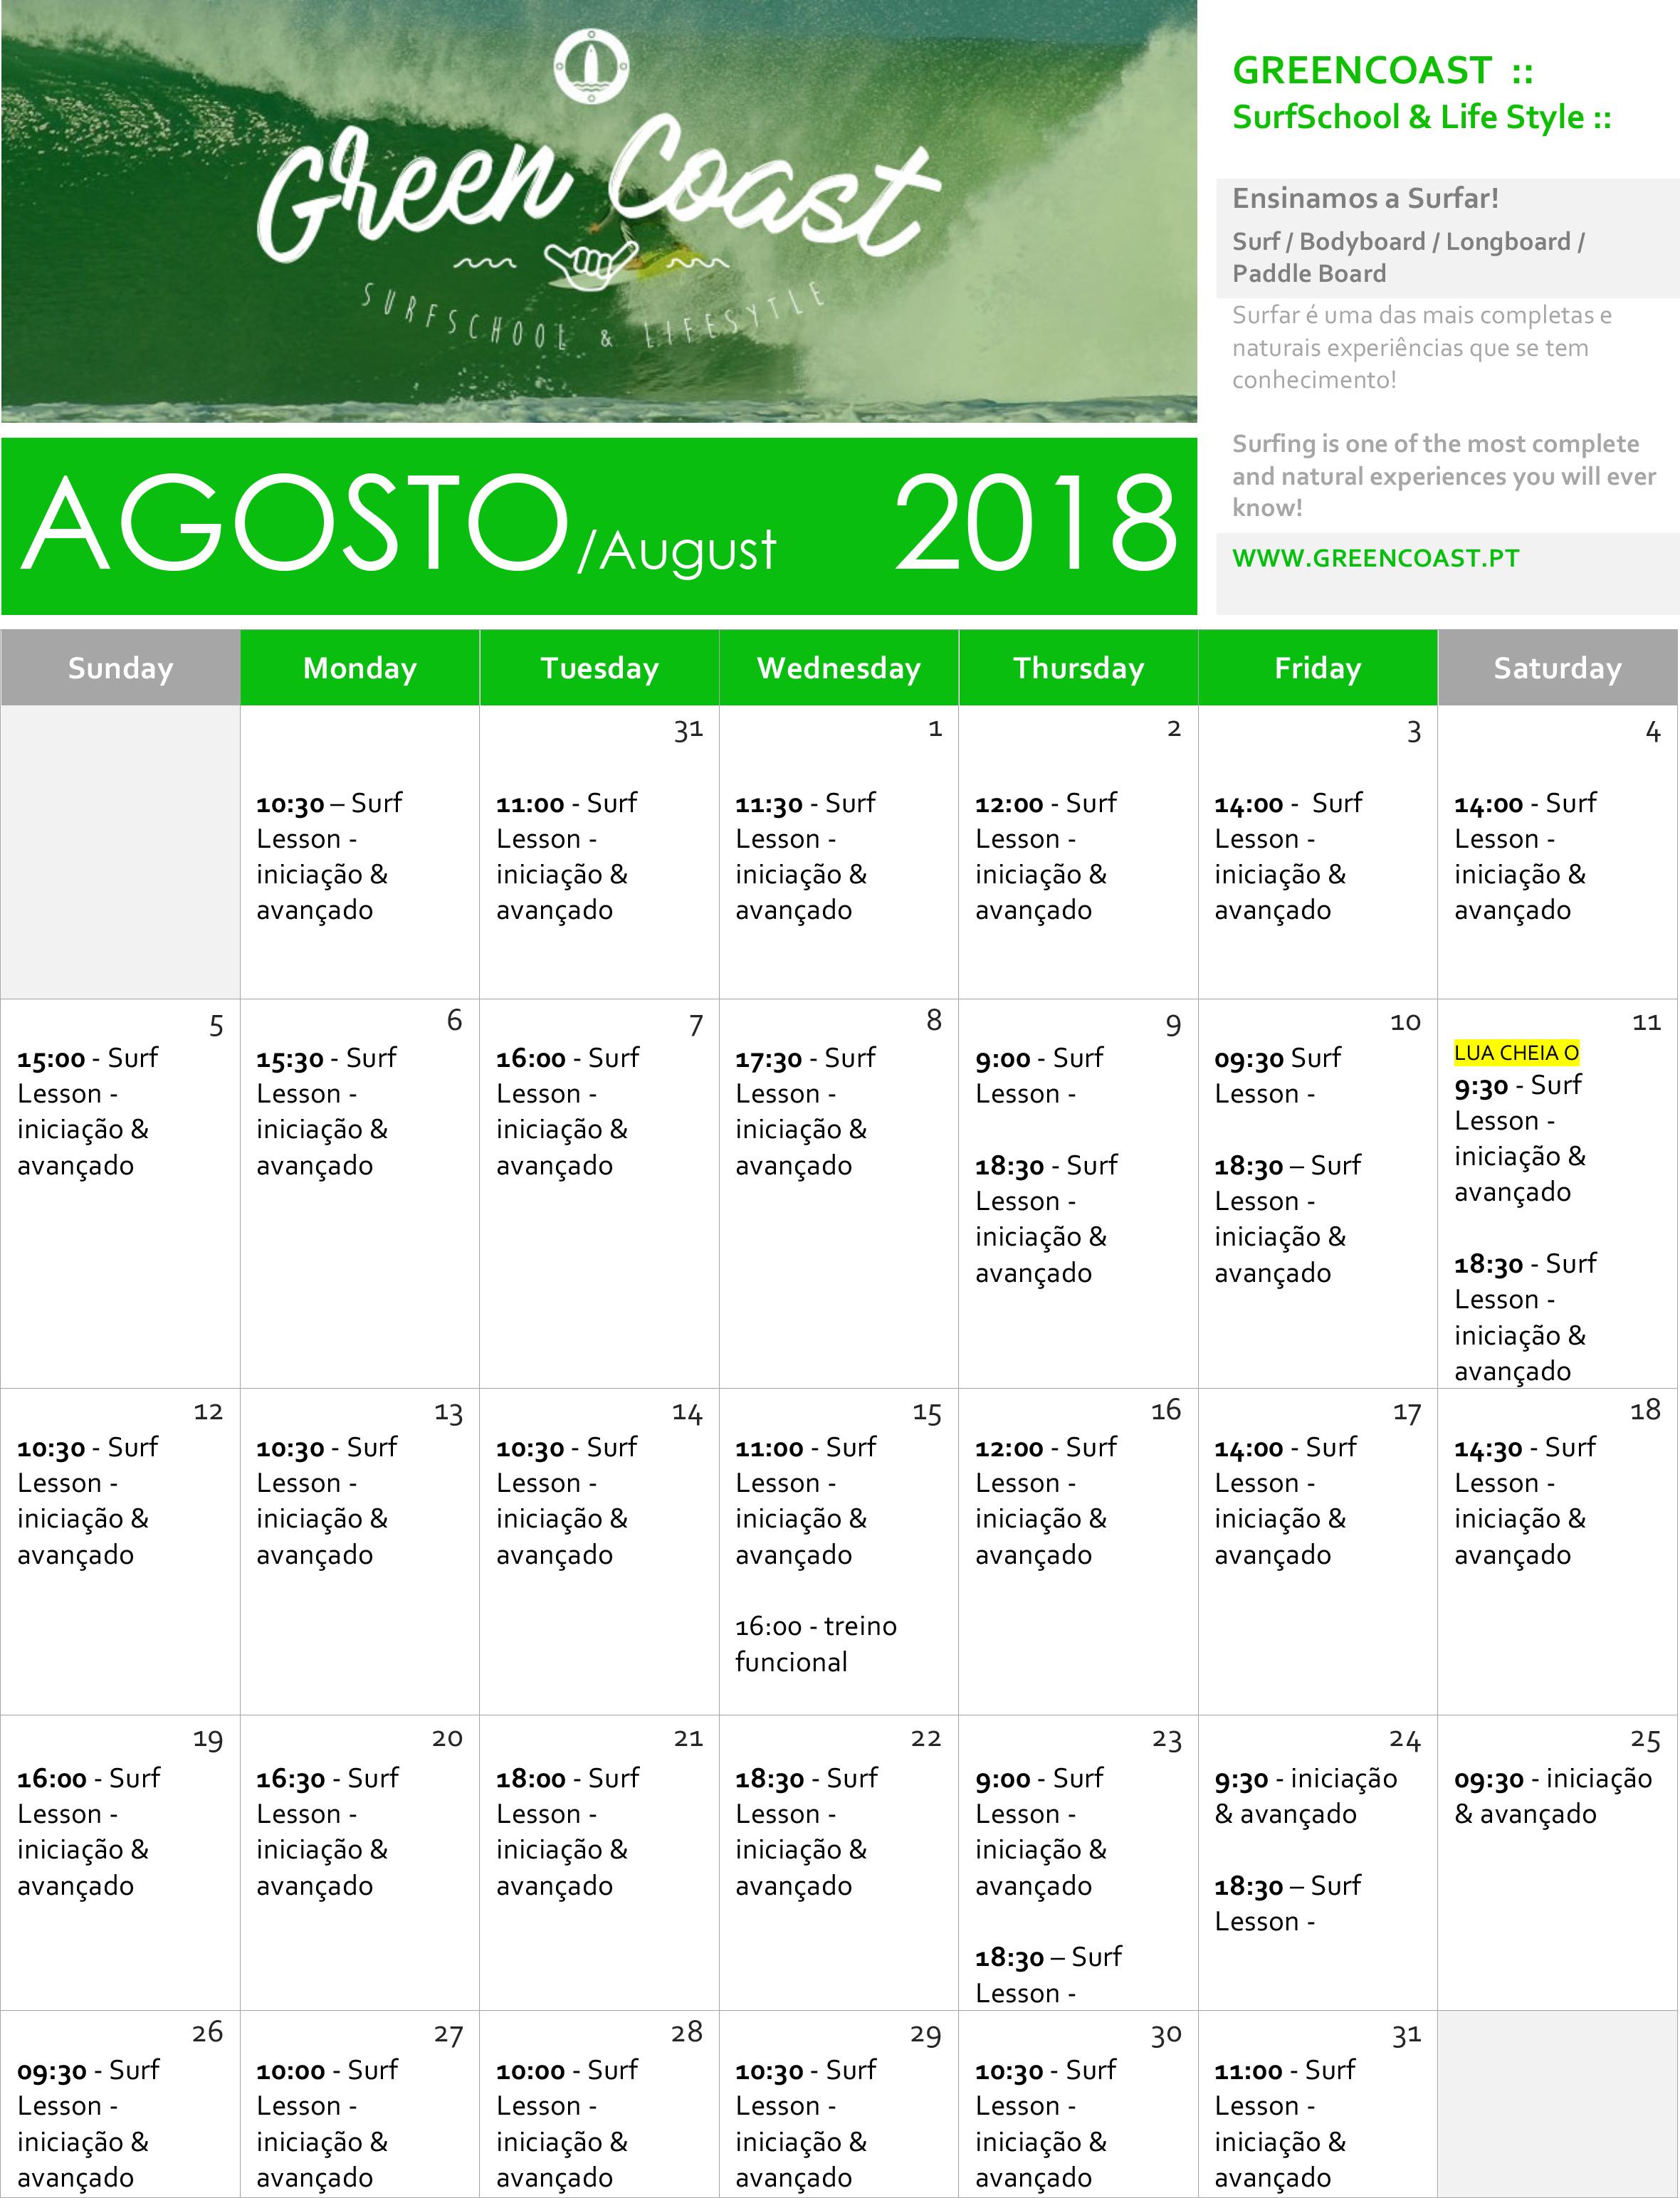 mapaagosto-august-greencoastsurfschool